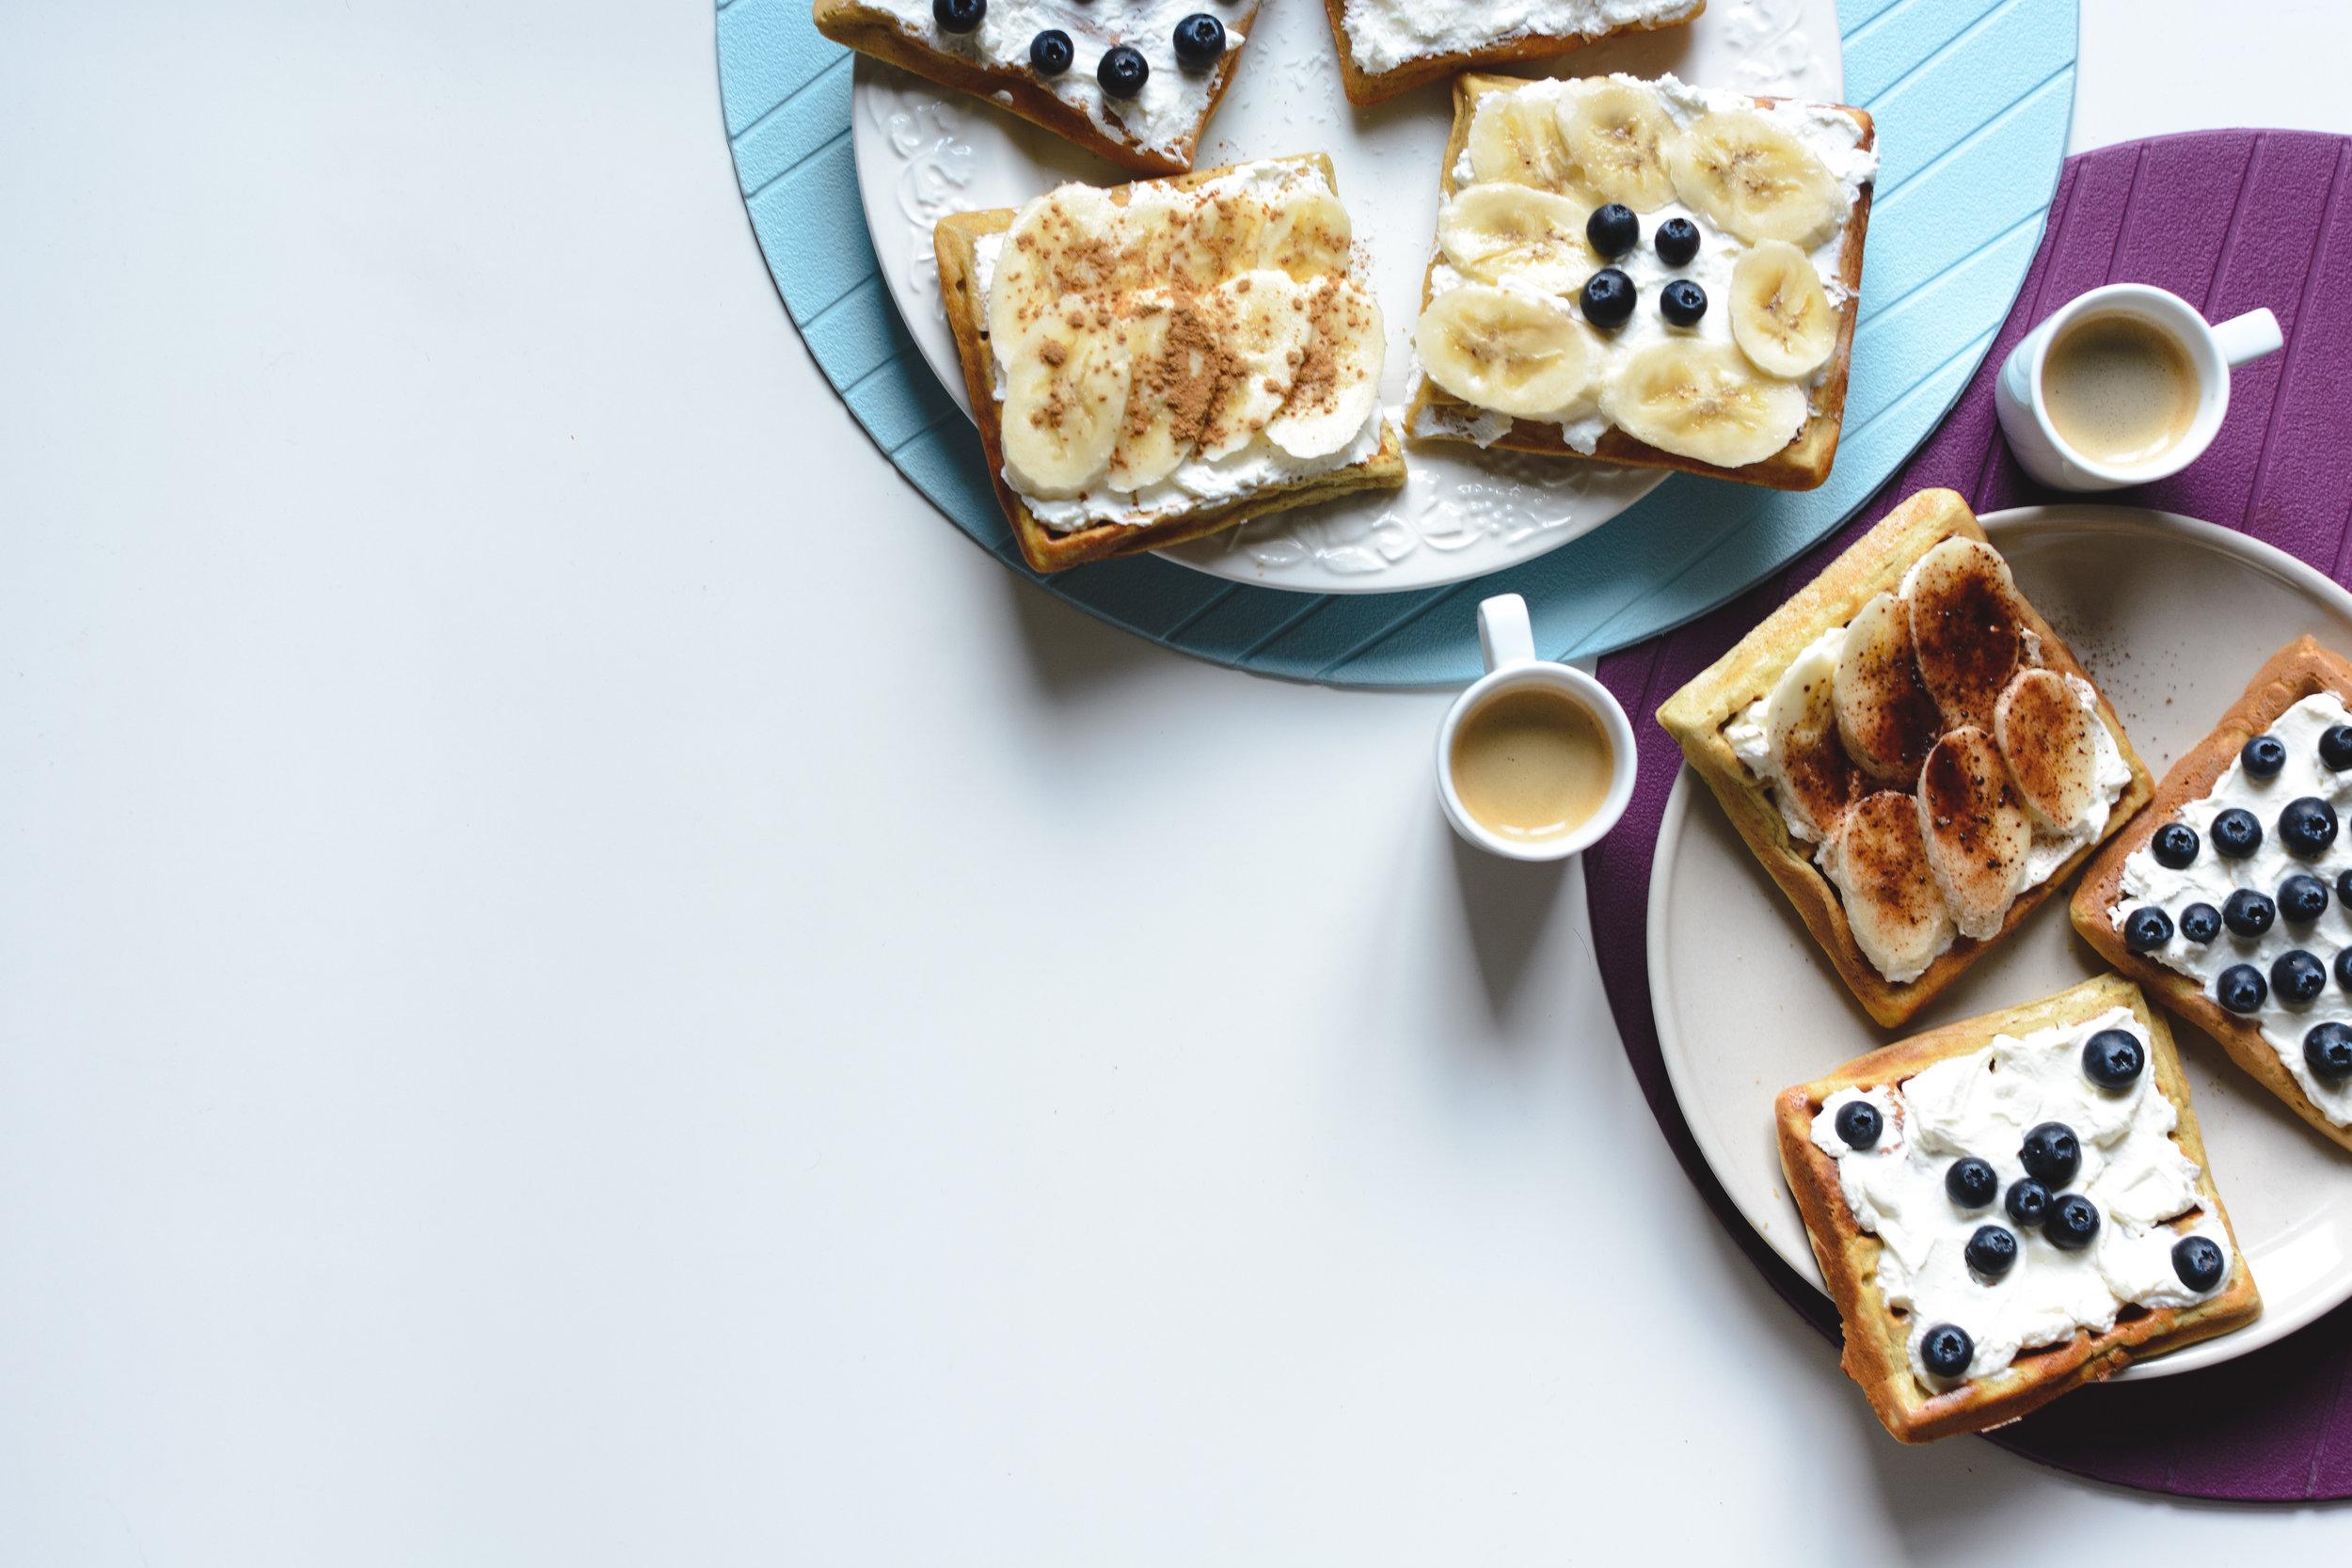 foodiesfeed.com_banana-and-bluberries-waffles-with-coffee-espresso.jpg